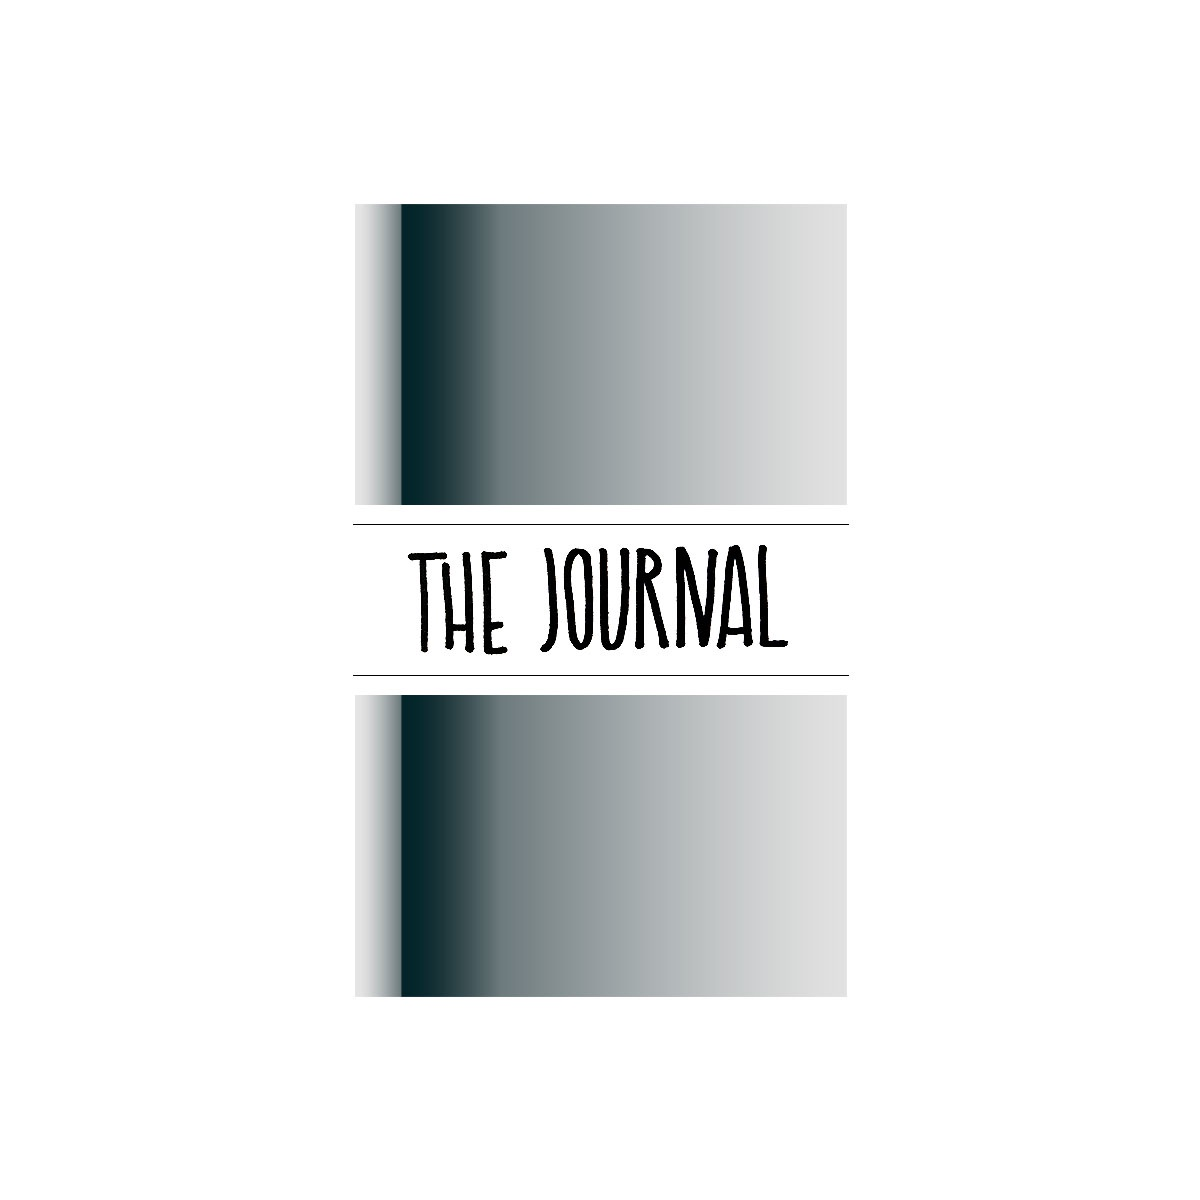 Maxgoodz Ежедневник The Journal Глянцевый Хром, 2 тетради, В5